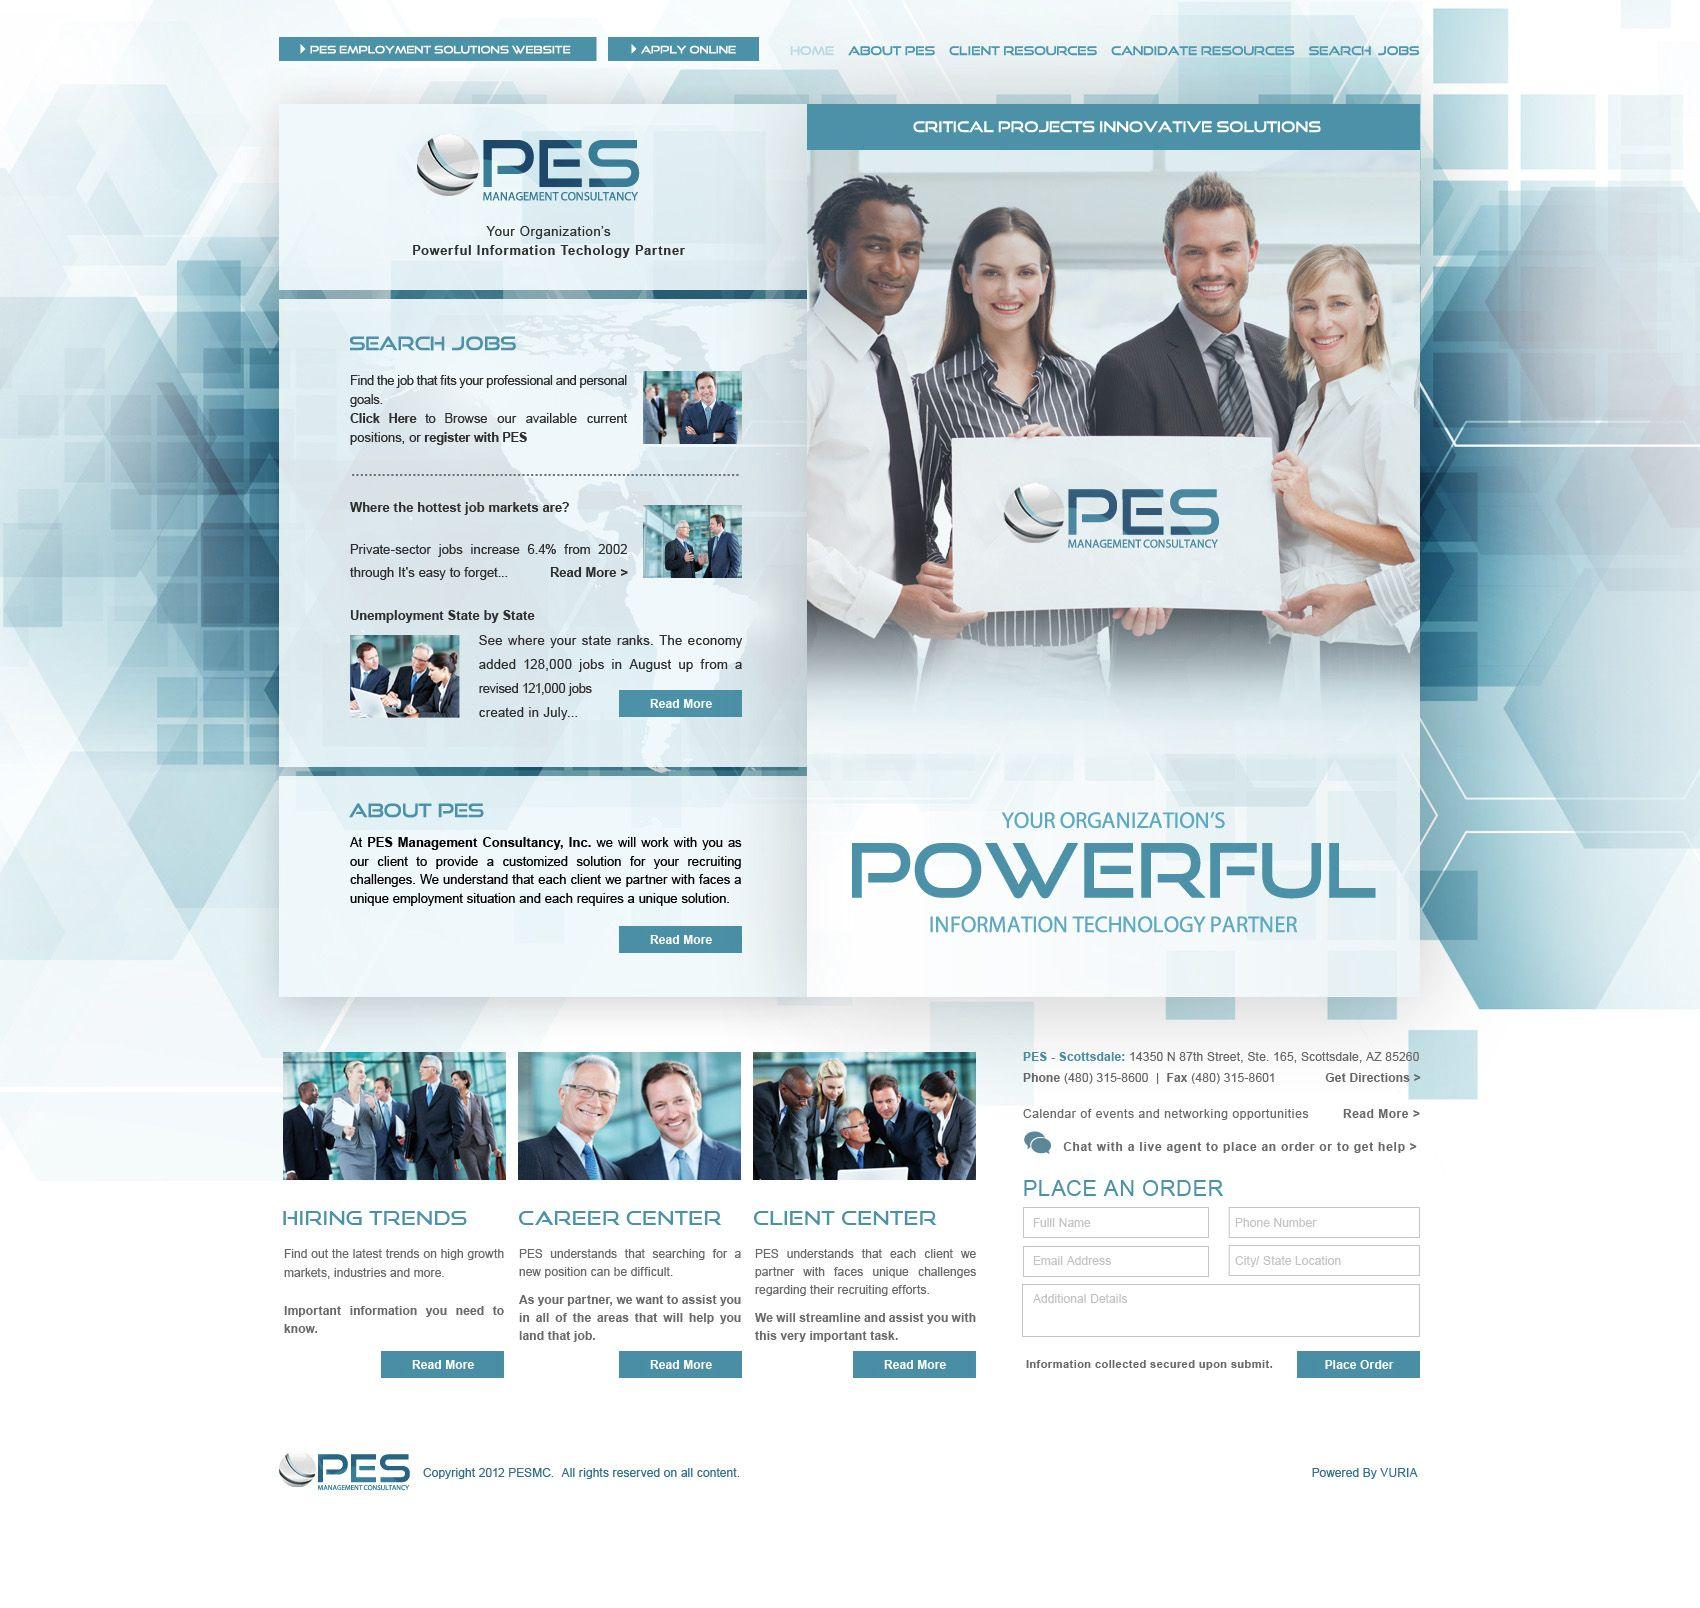 Pes Management Consultancy Website Designed By Vuria Creative Technology Http Www Vuria Com View The Li With Images Website Design Web Development Design Web Design